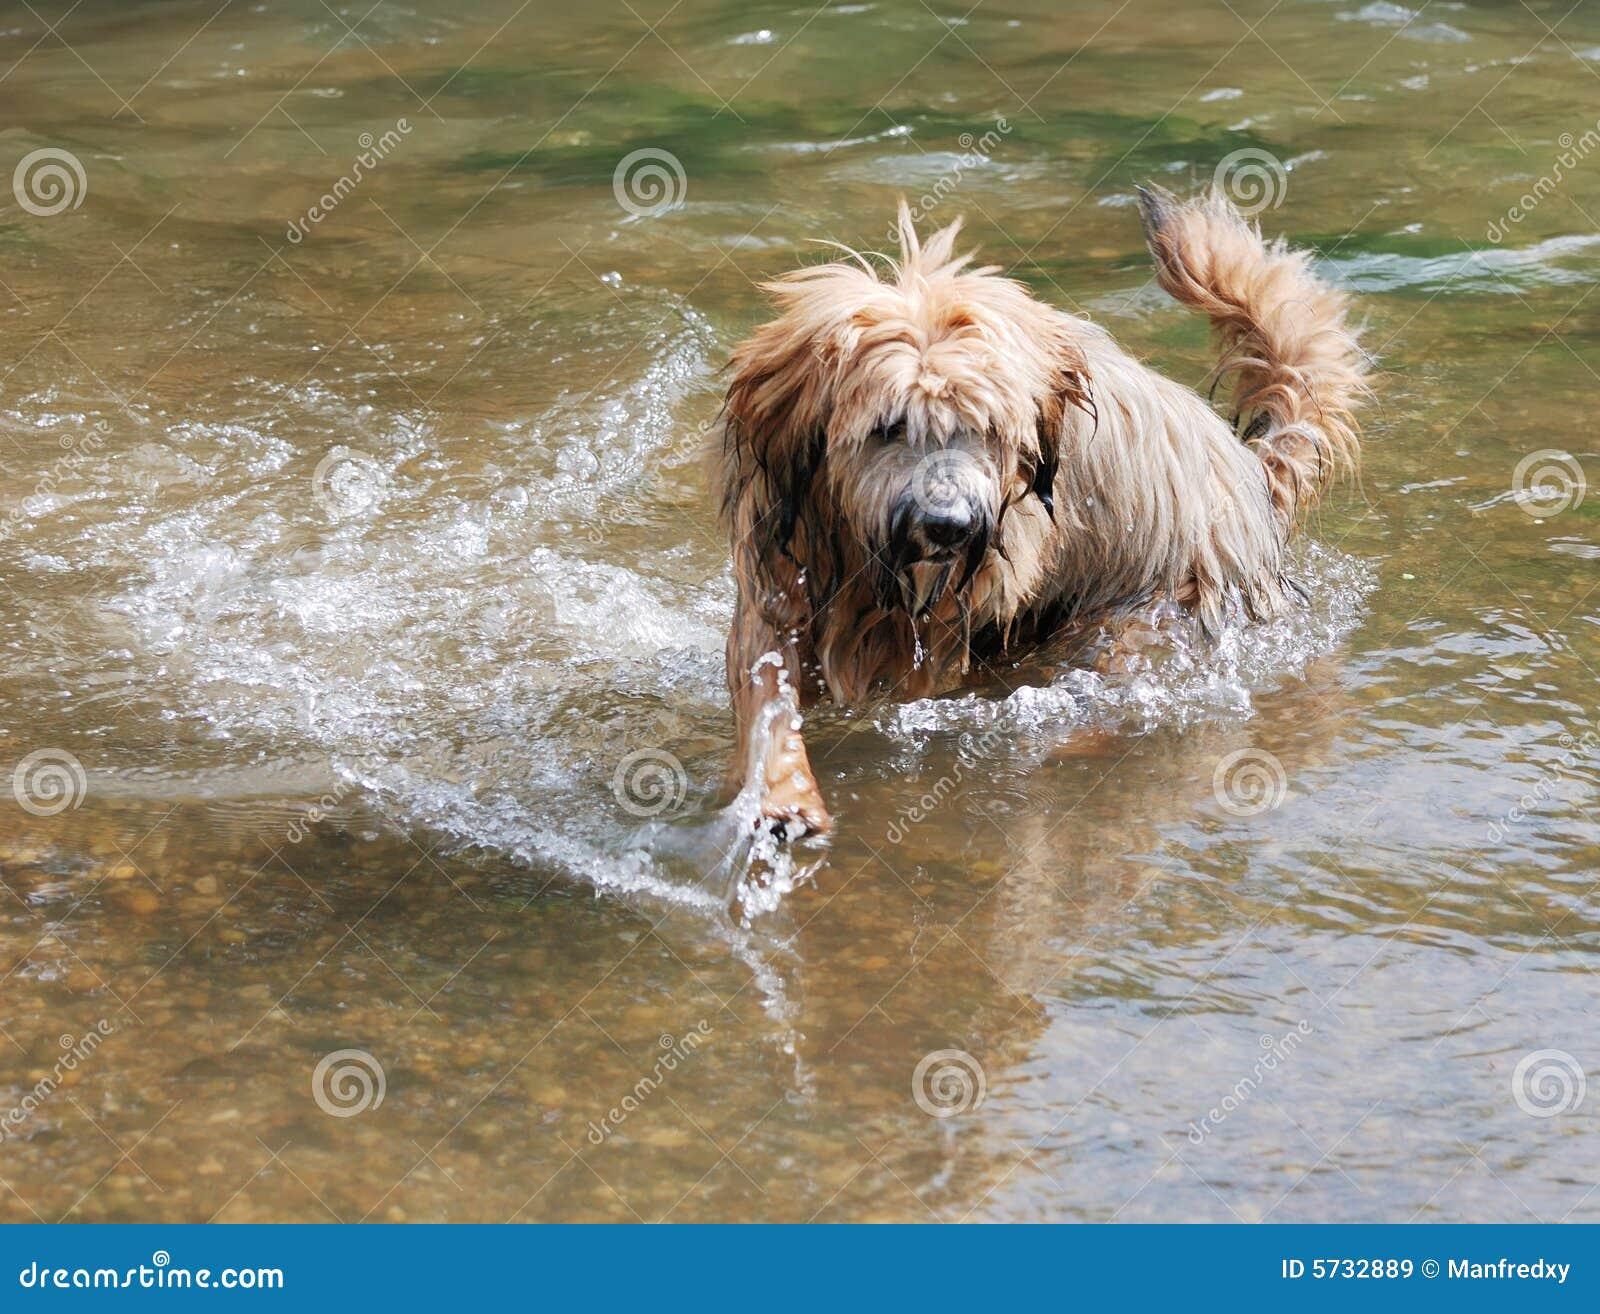 Tibetan Terrier Dog Royalty Free Stock Images - Image: 5732889